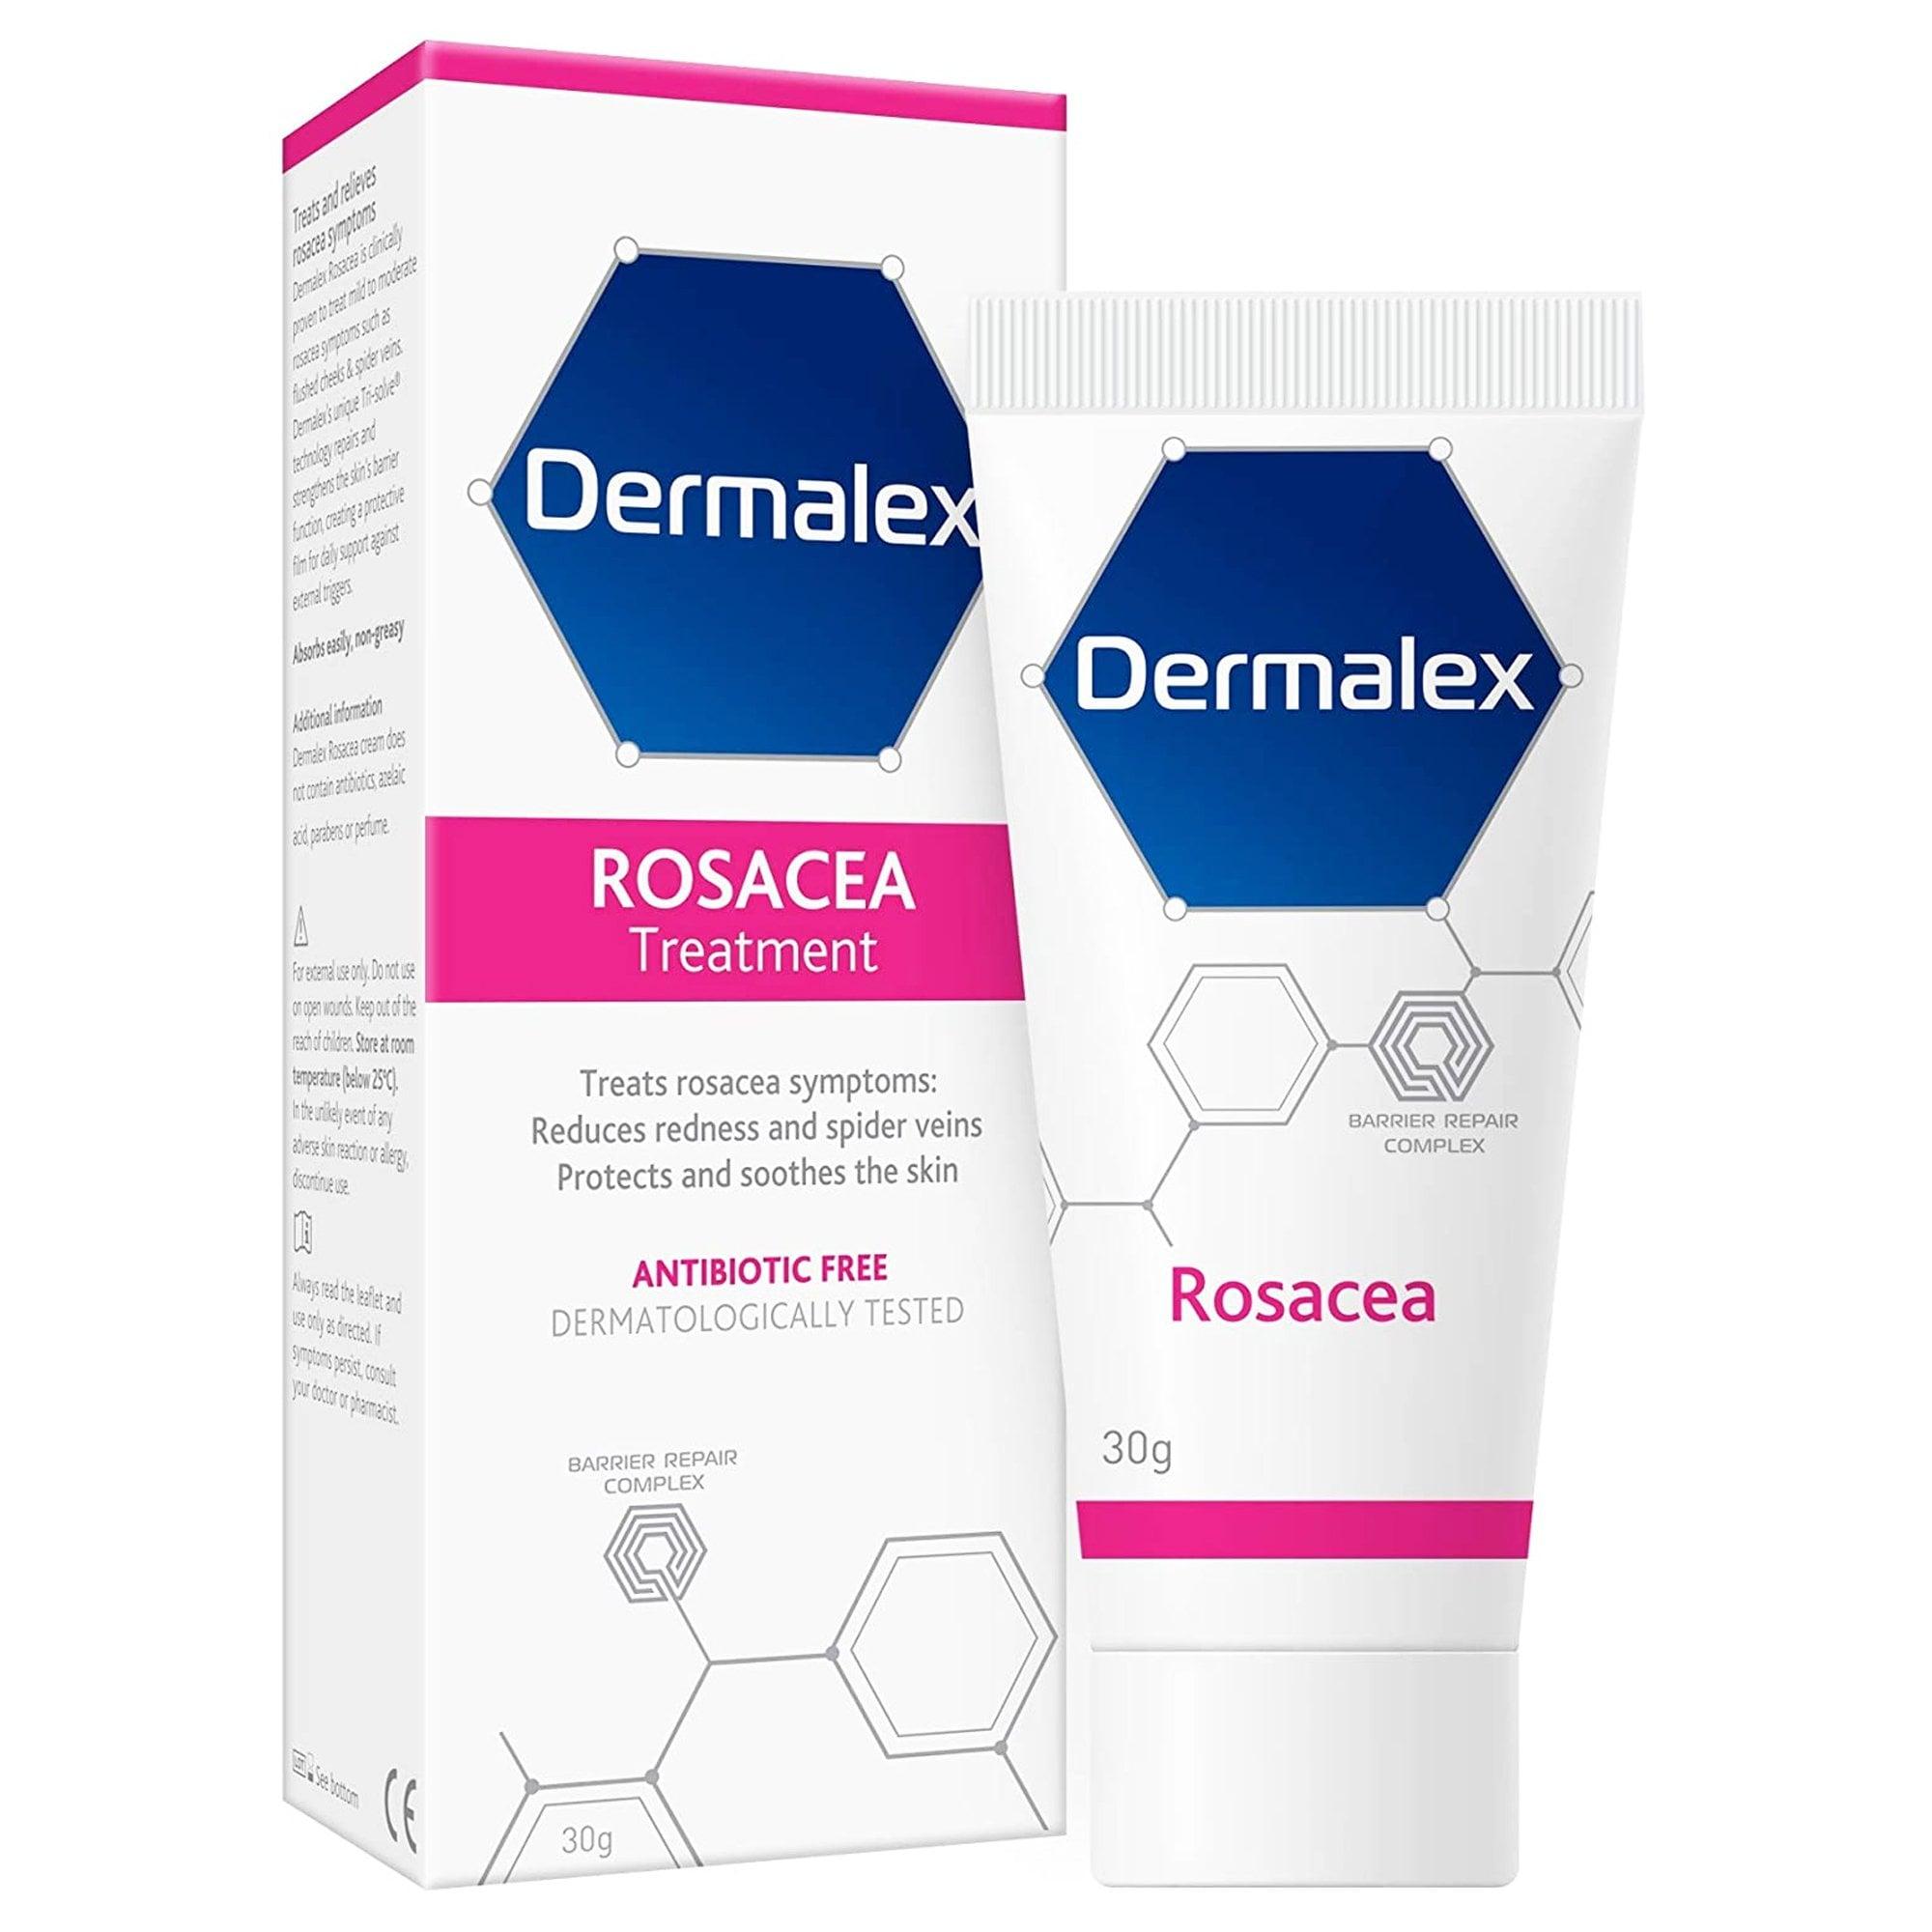 Dermalex Rosacea Cream Skin Care Travelpharm